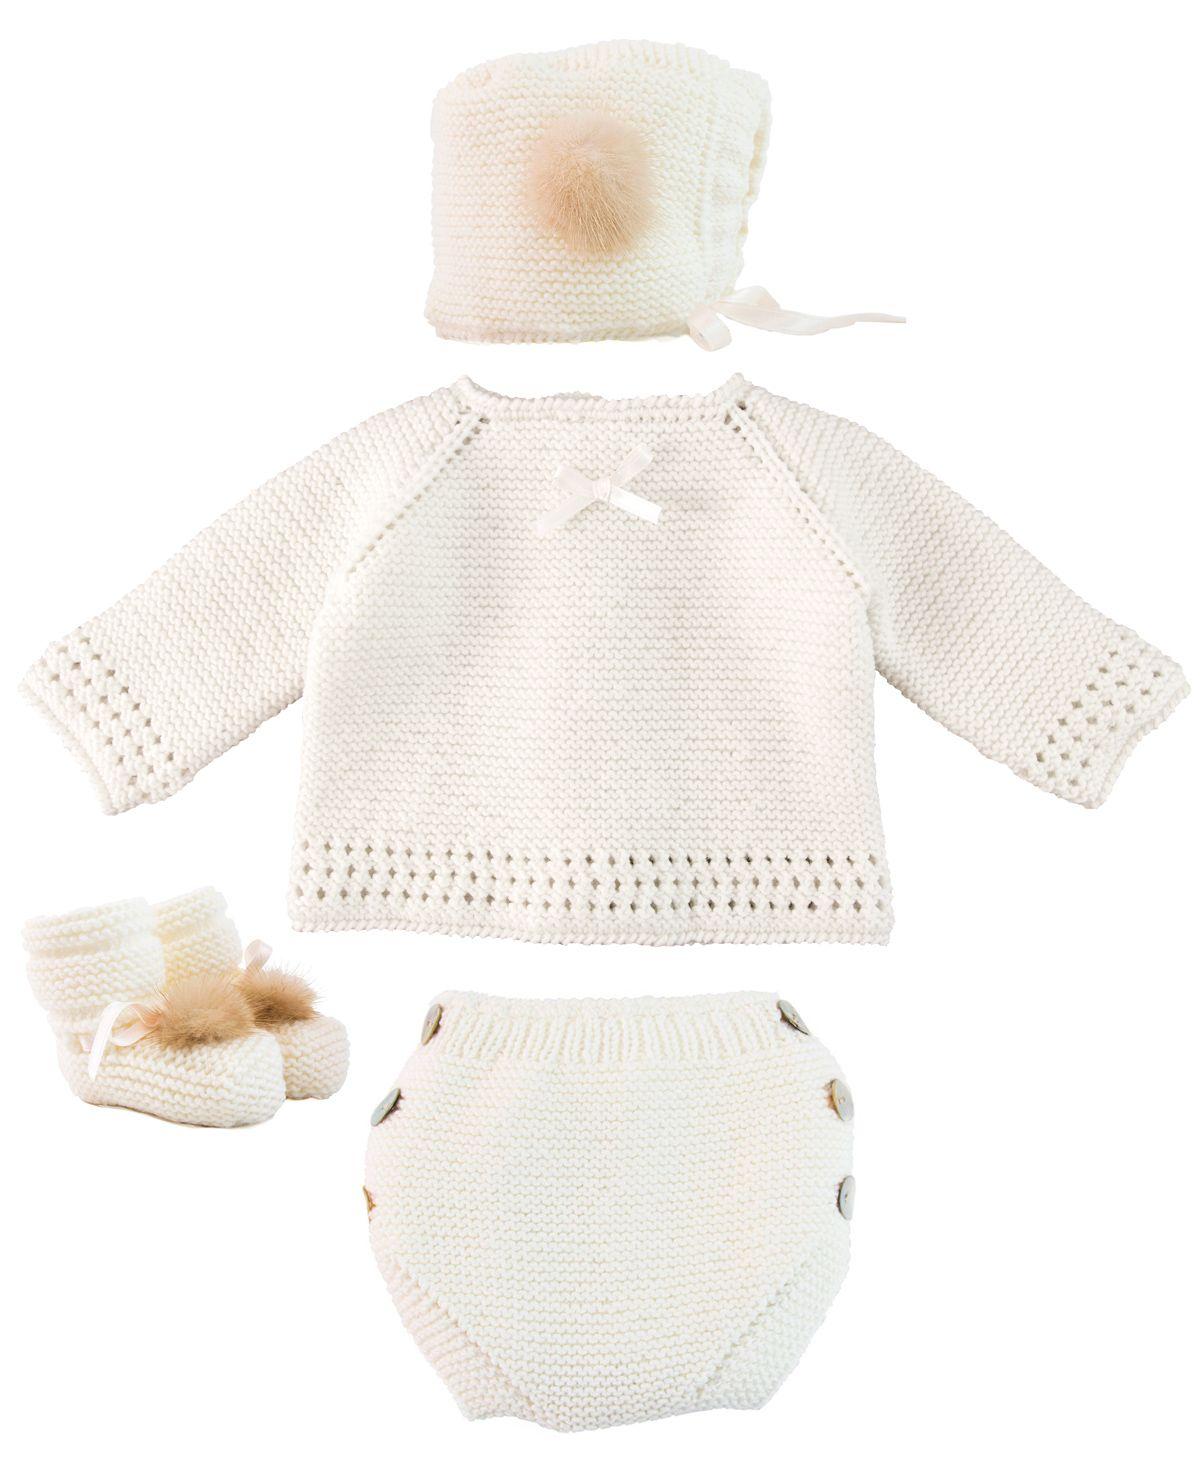 Conjunto Bebe RO INFANTIL Punto Crudo - Ro Infantil 98d80dce4c0